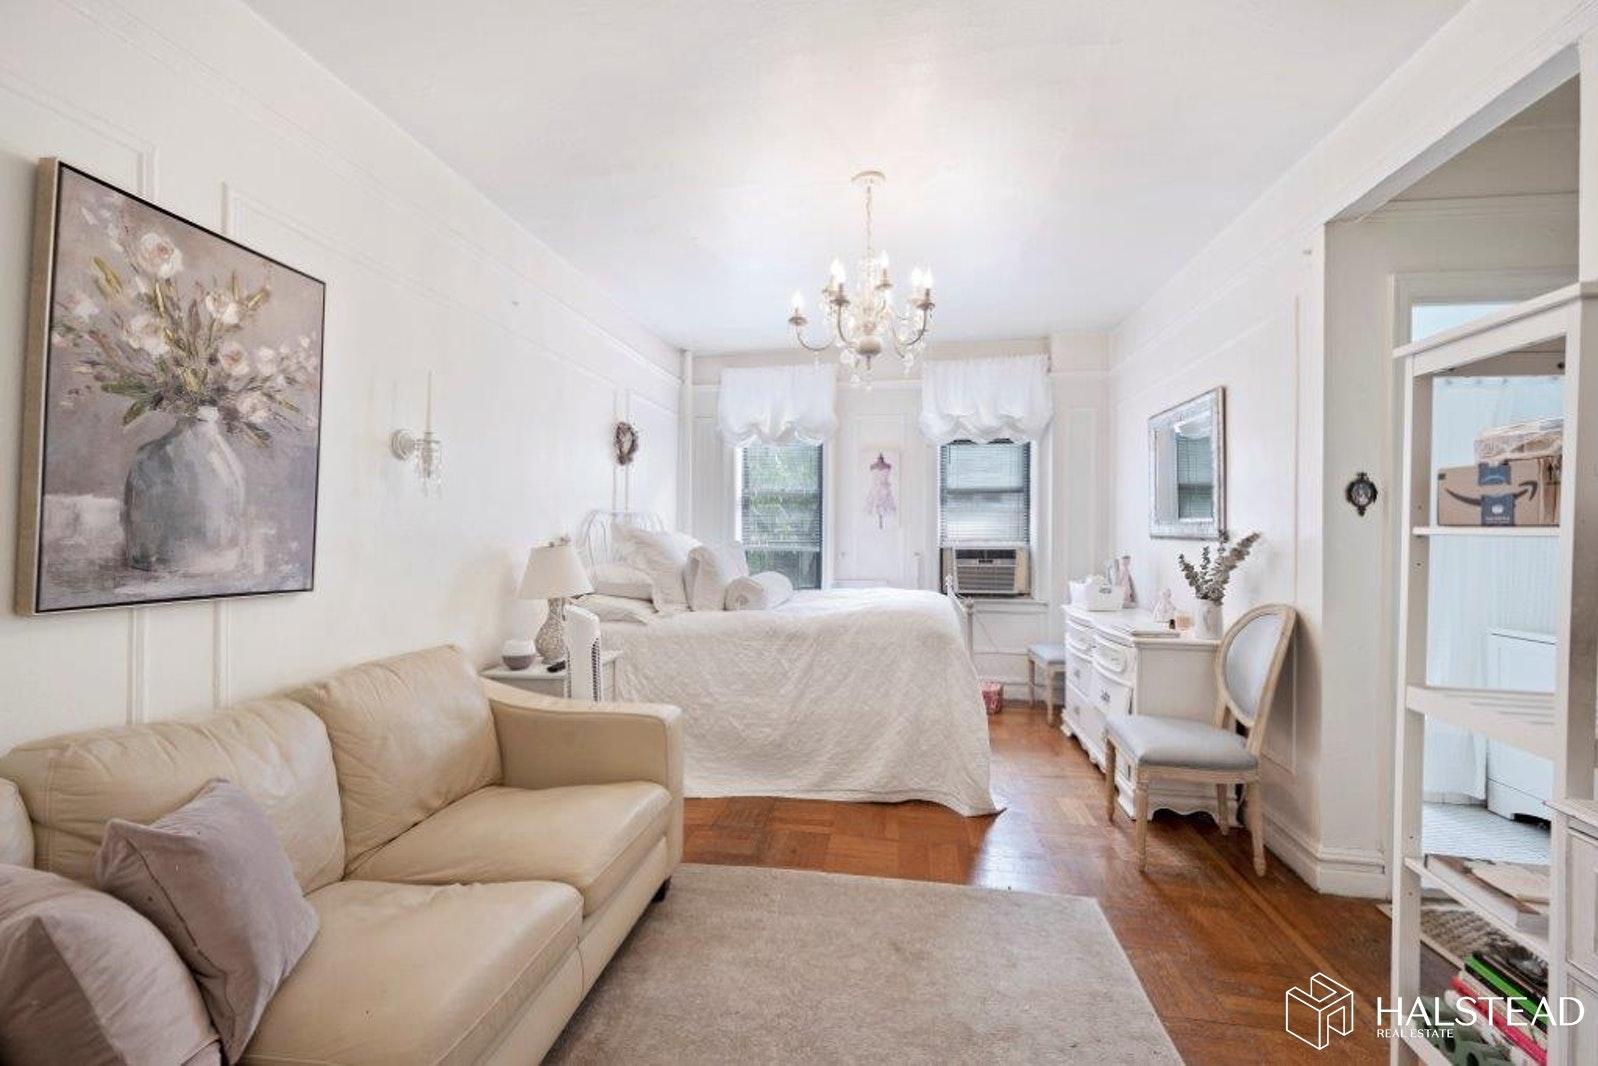 221 EAST 76TH STREET 2B, Upper East Side, $2,000, Web #: 20294278